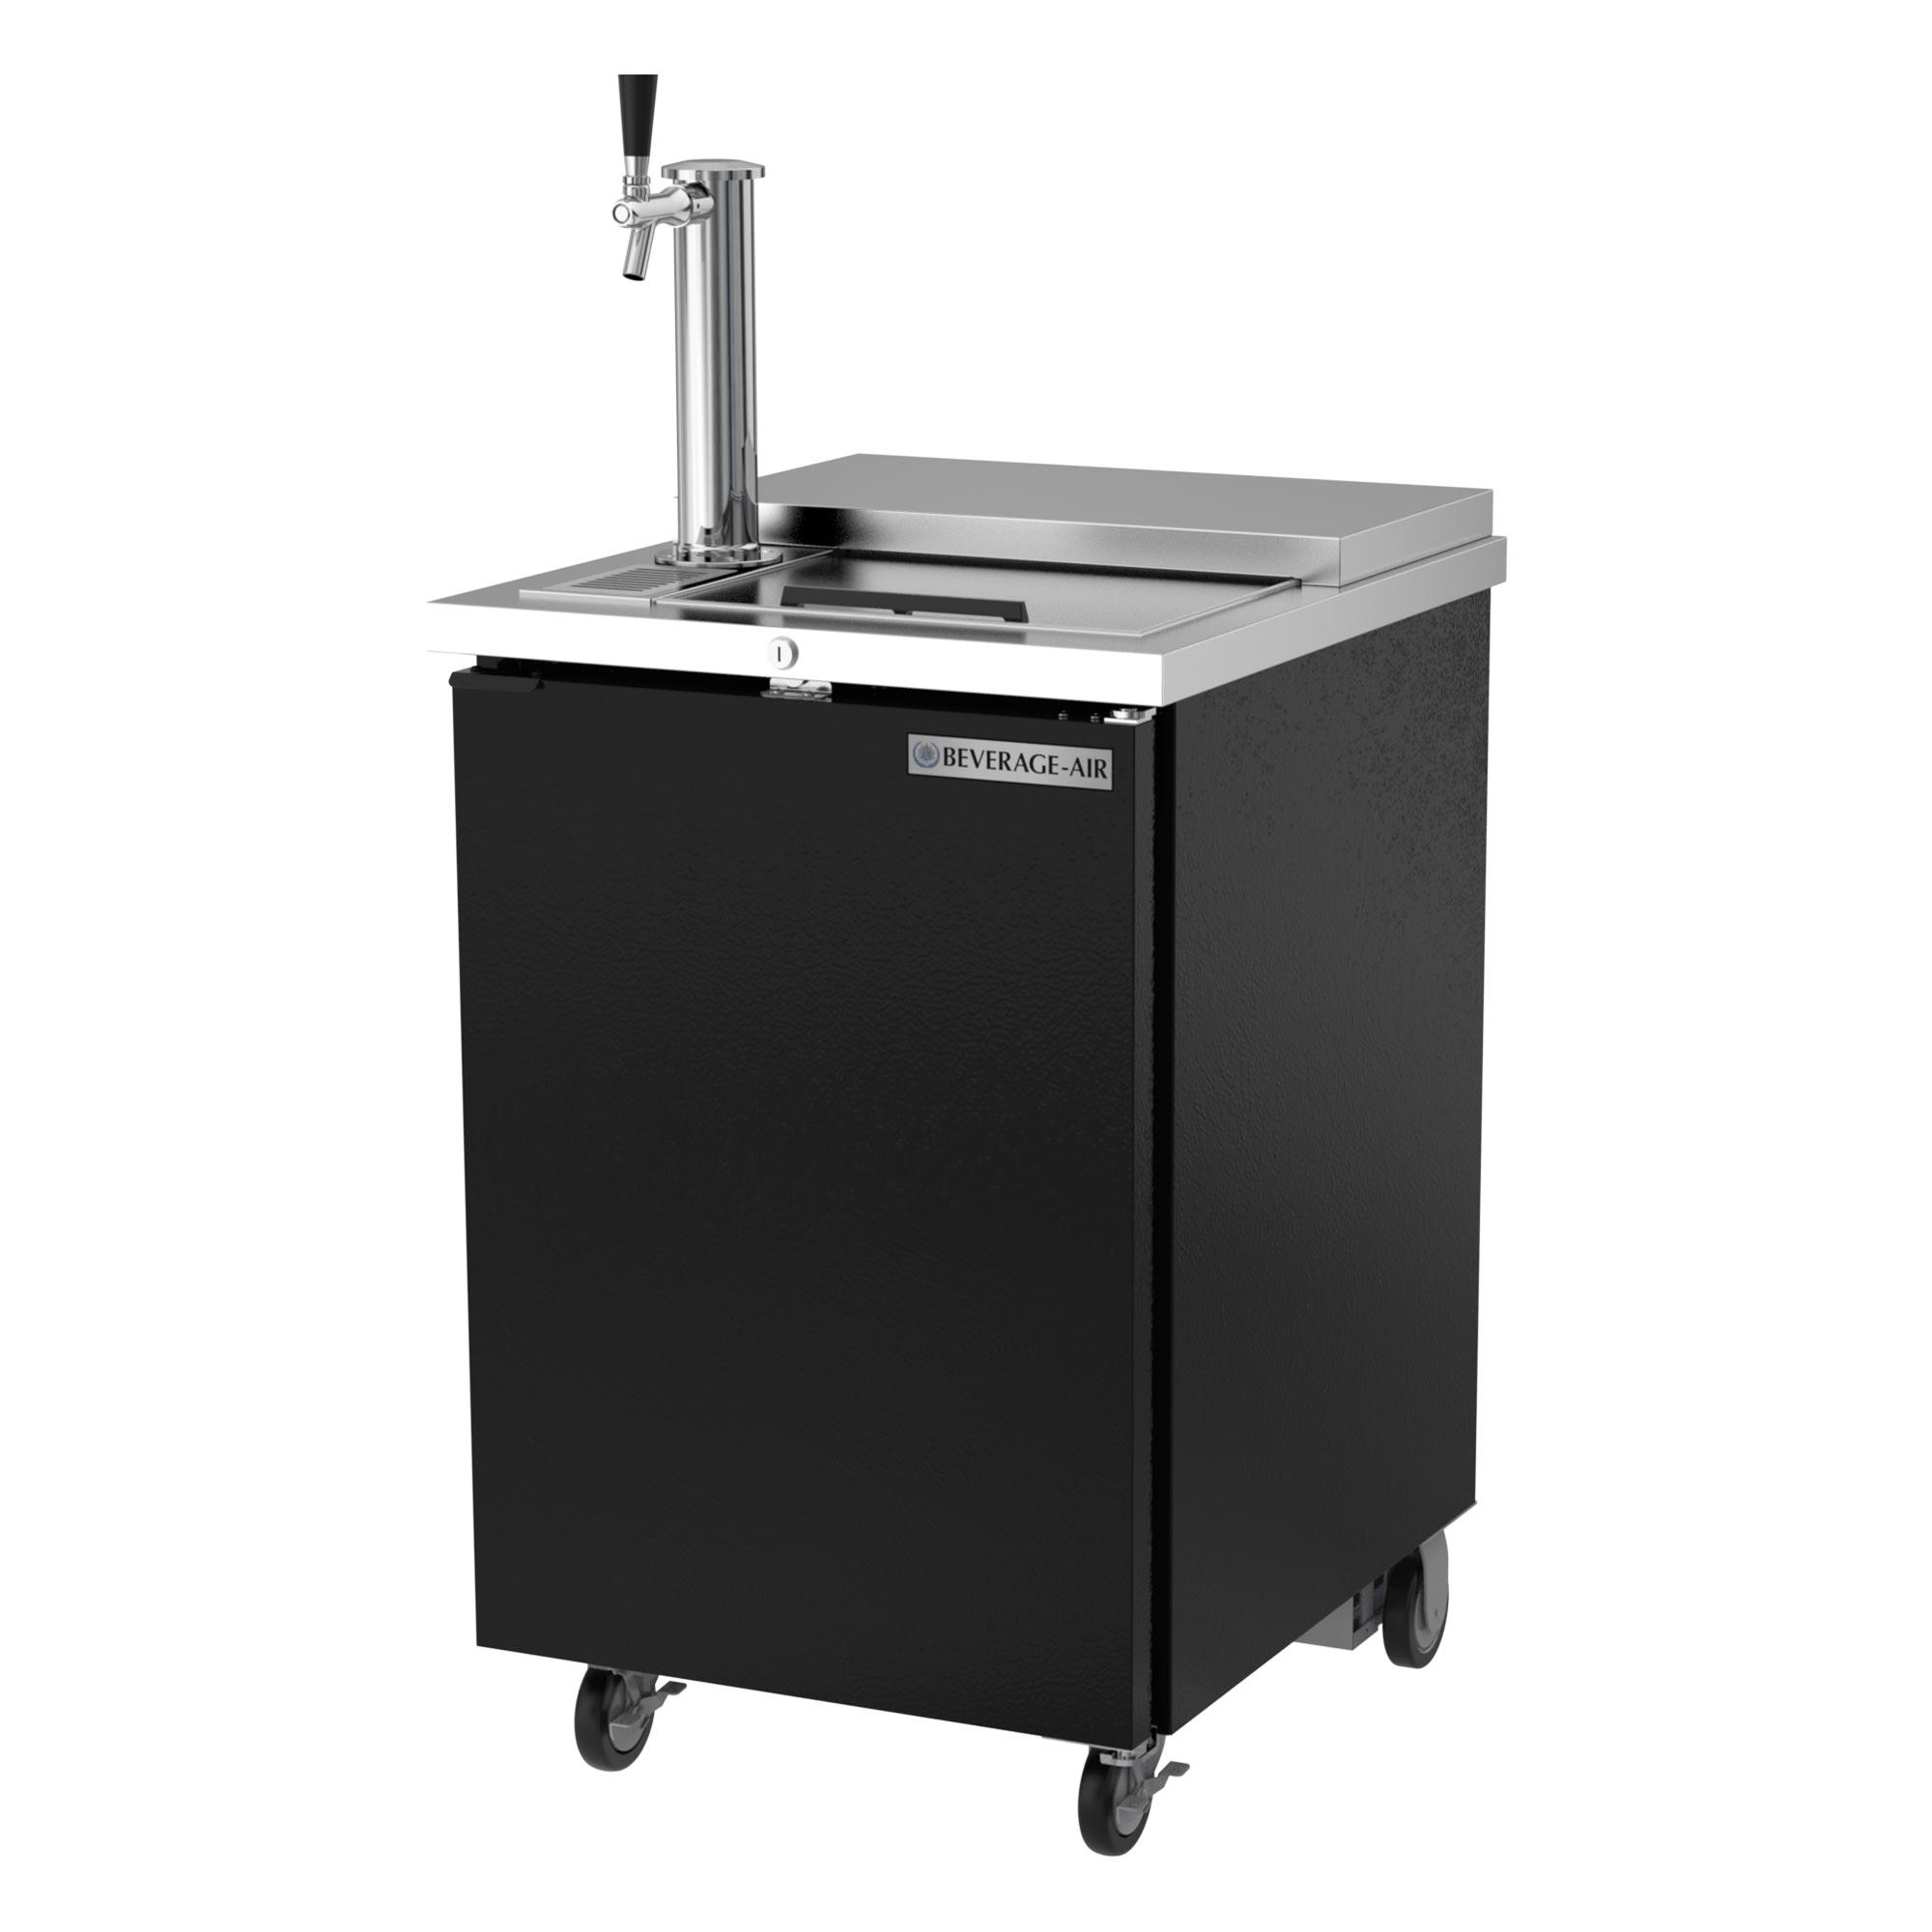 "Beverage Air BM23HC-C-B 24"" Draft Beer System w/ (1) Keg Capacity - (1) Column, Black, 115v"